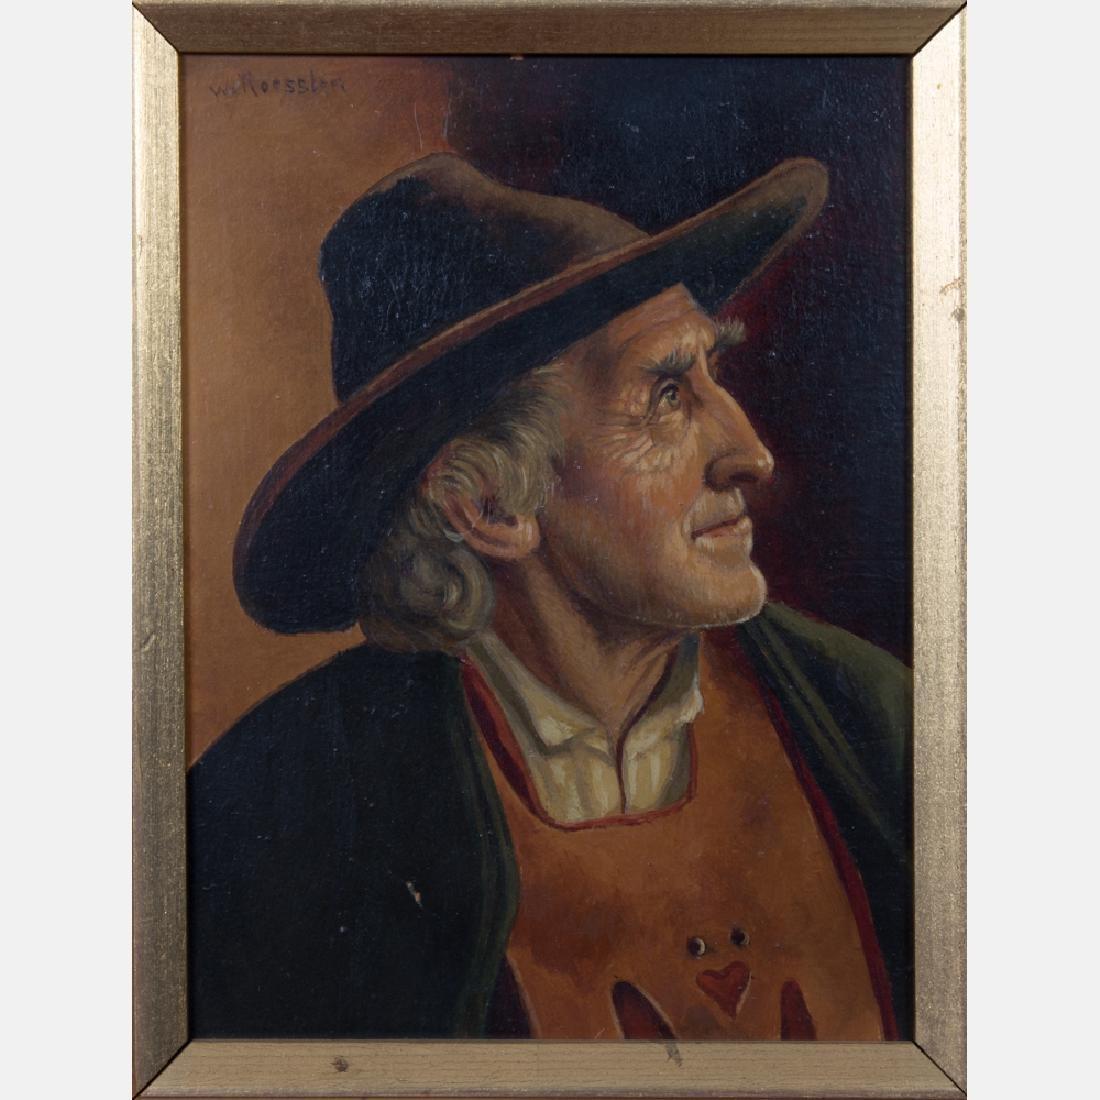 Walter Roessler (1893-1960) Portrait of a Man, Oil on